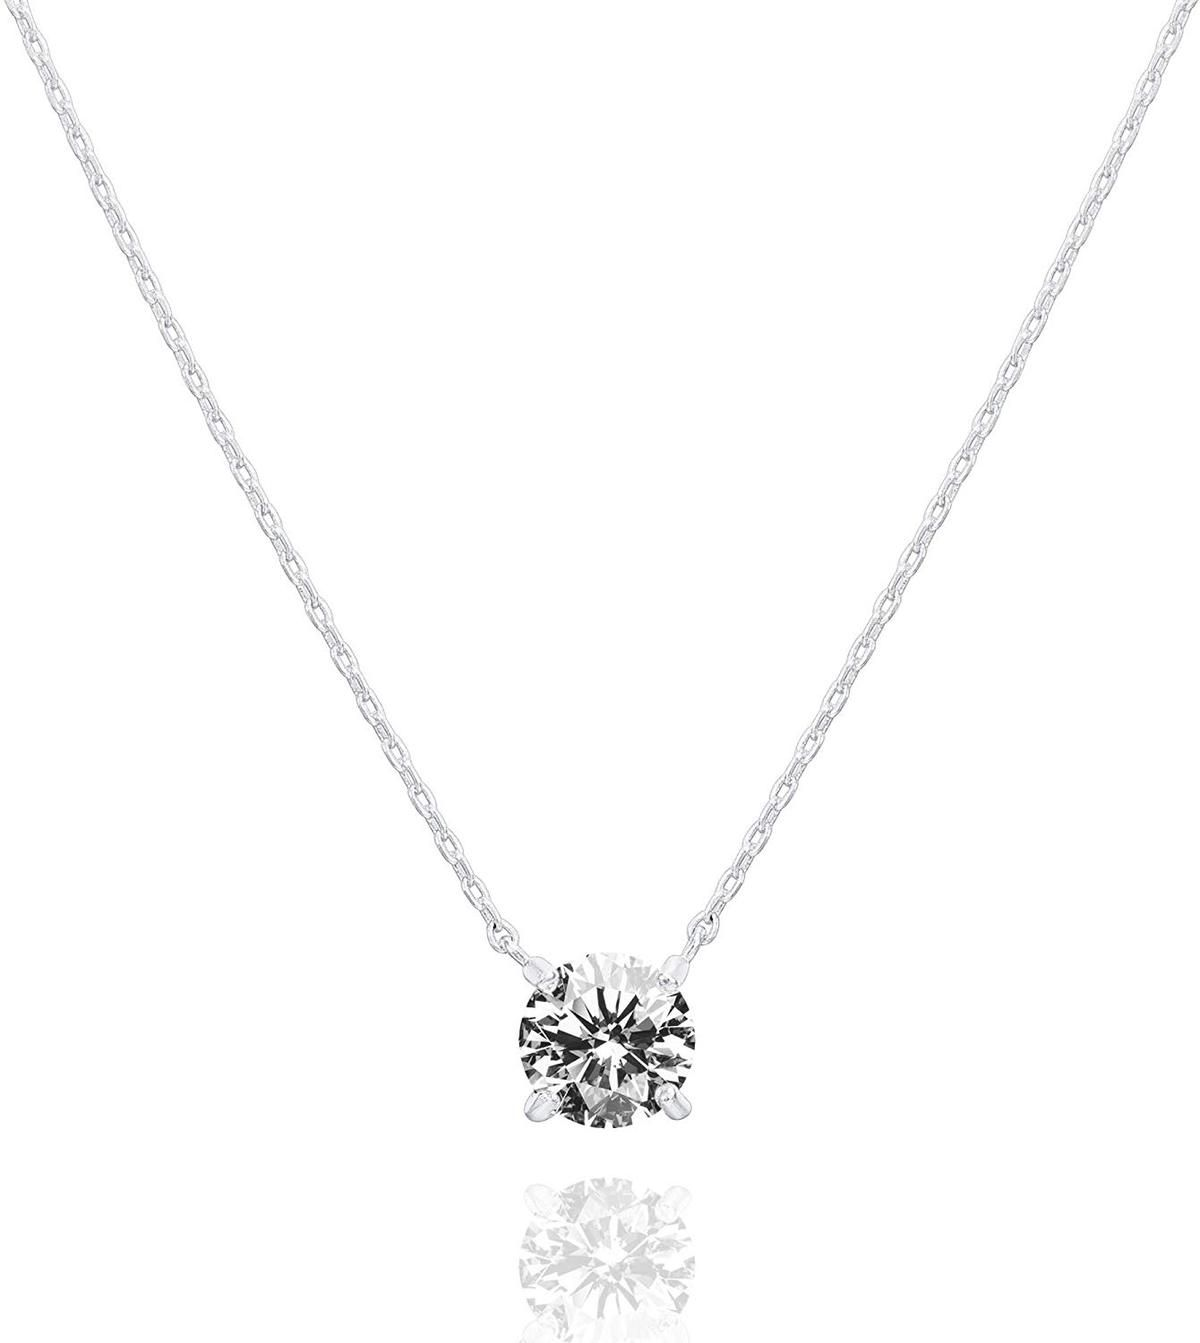 DiamondJewelryNY Choker Necklace 4 Pc Clear Cubic Zircon Adjustable Choker Neck